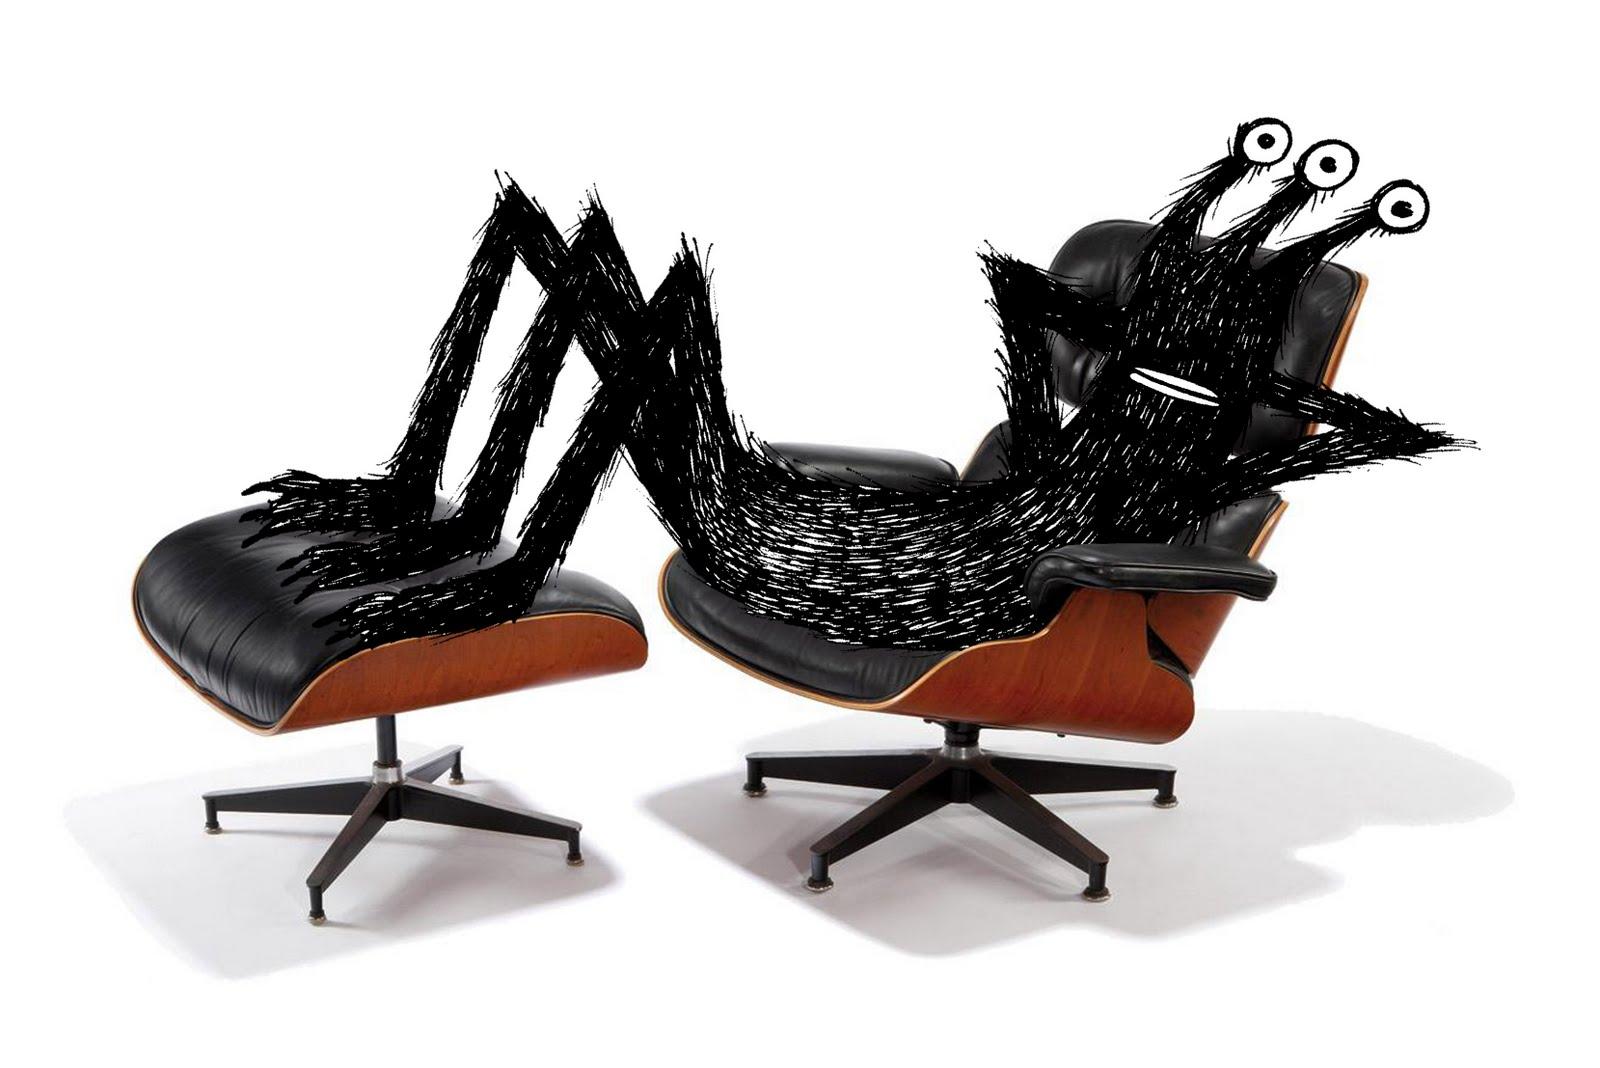 eames lounge chair image 250. Black Bedroom Furniture Sets. Home Design Ideas